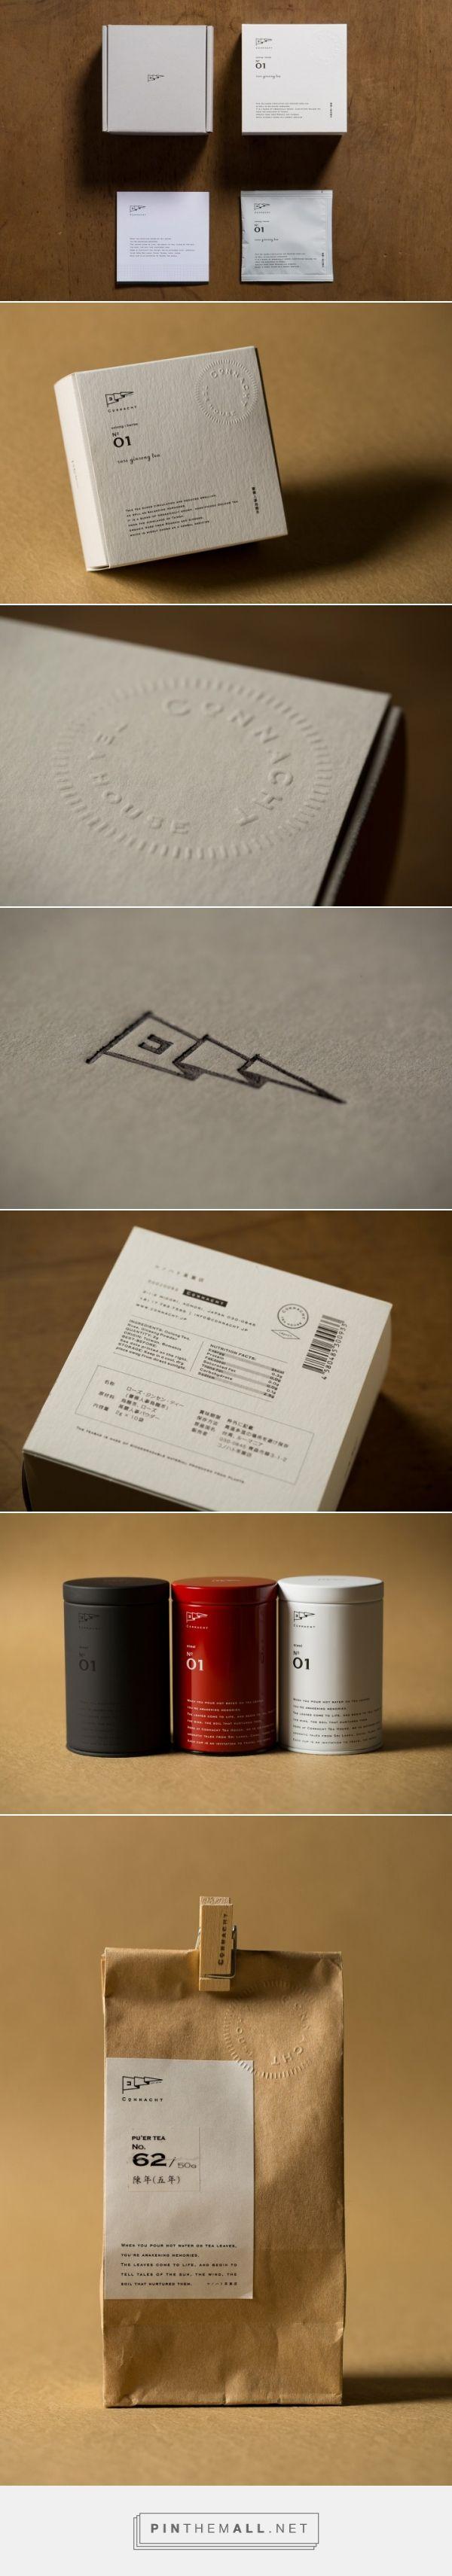 packaging / package design | Cqnnacht (コノハト茶葉店)